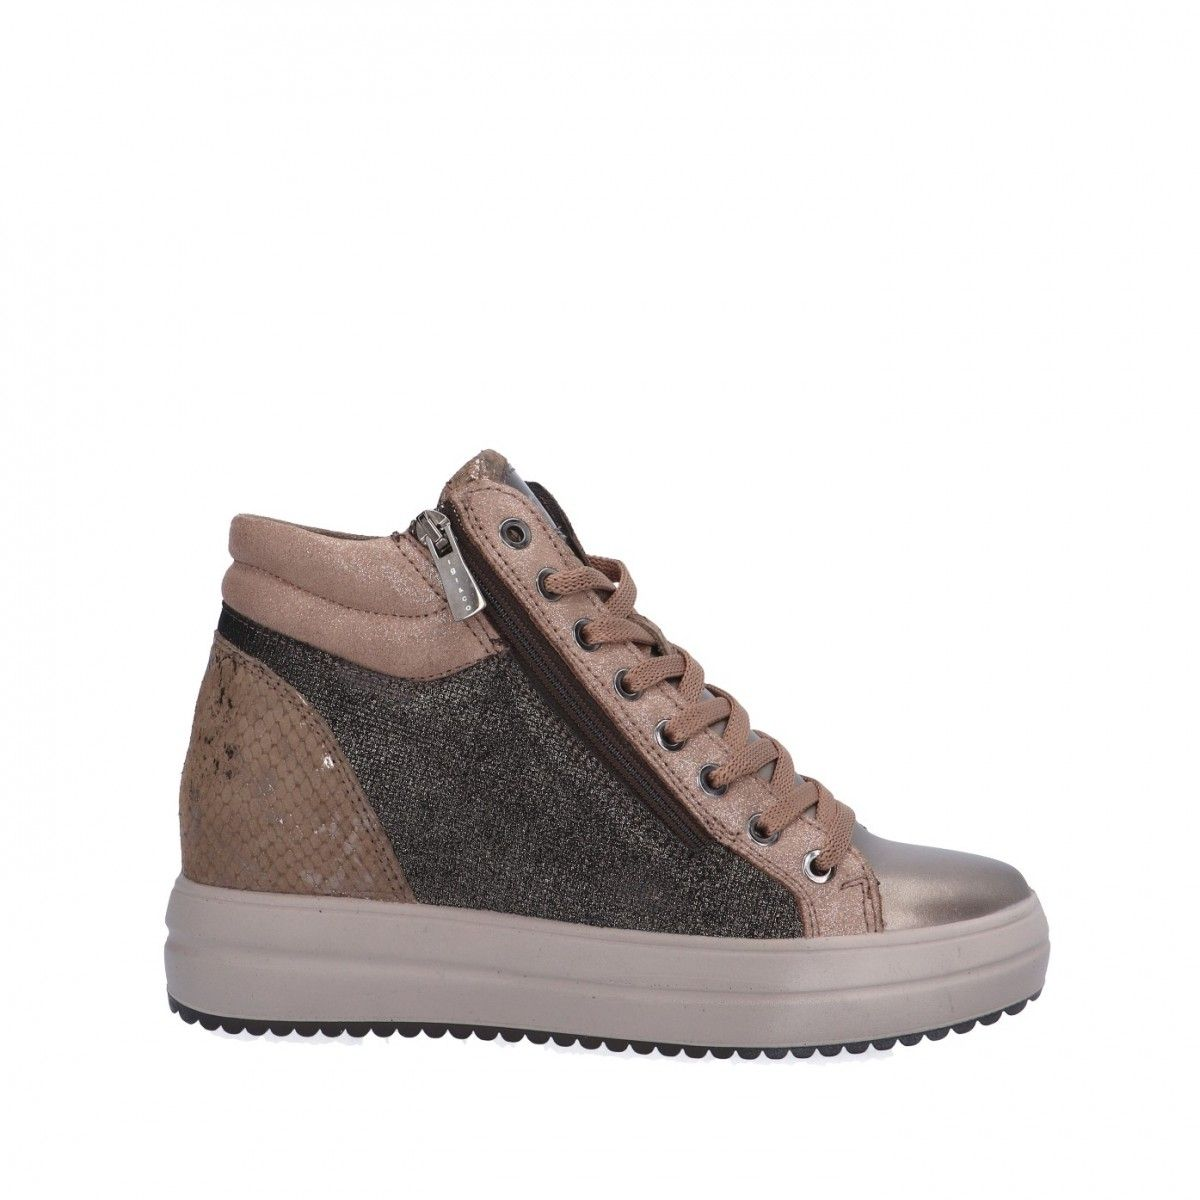 Igi&co Sneaker alta Visone...